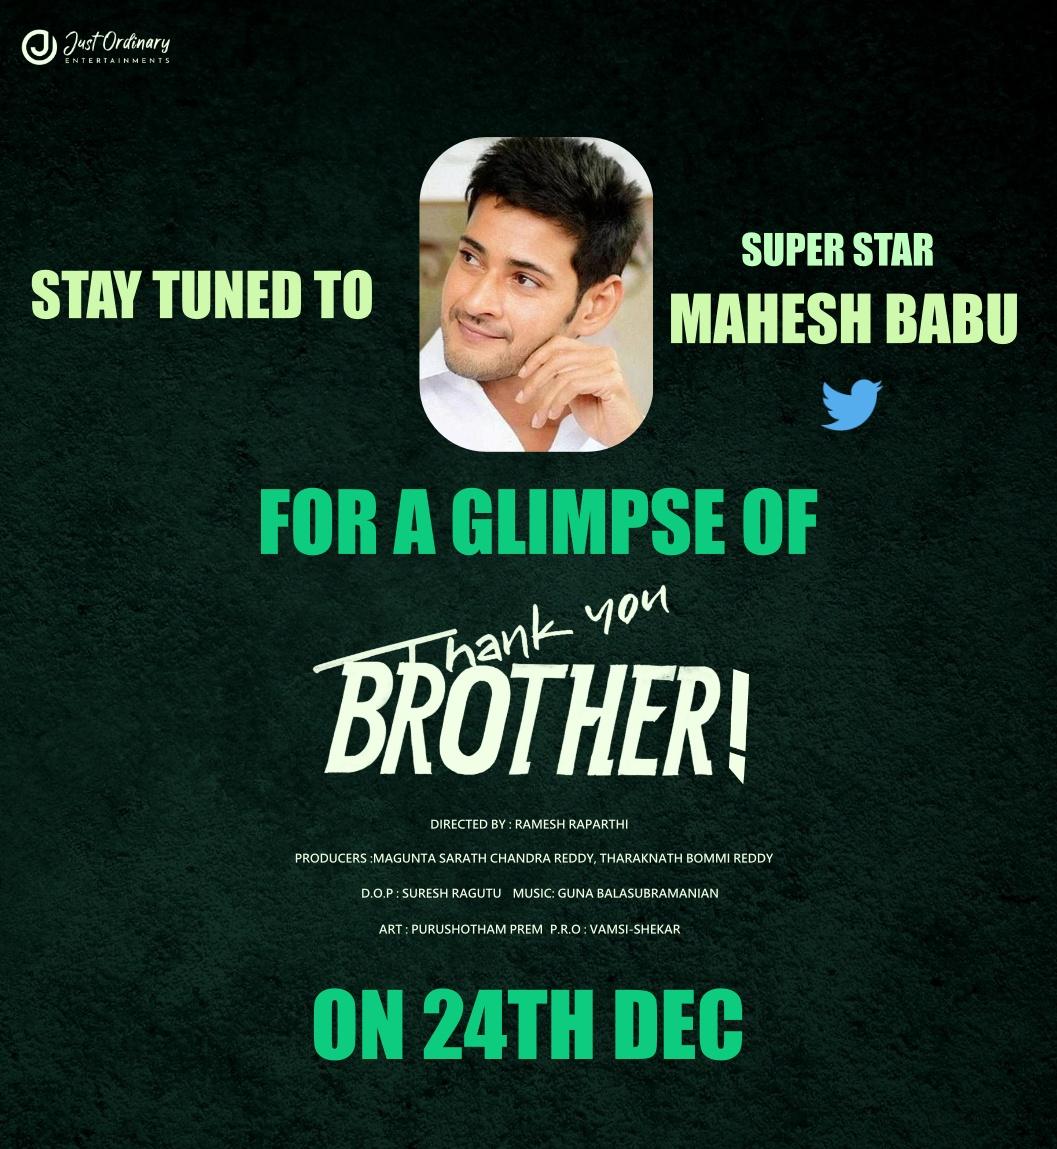 Super star @urstrulyMahesh to launch the first glimpse of #ThankYouBrother on 24th Dec.  Stay tuned! ⭐ing @anusuyakhasba @viraj_ashwin @monie_kaa @harshachemudu @anishkuruvilla 🎬@Raparthy 🎥@sureshragutu1 🎼@gunasekaran_gm 💰 @MaguntaSarath in  @JustOrdinaryEnt #ThankYouBrother